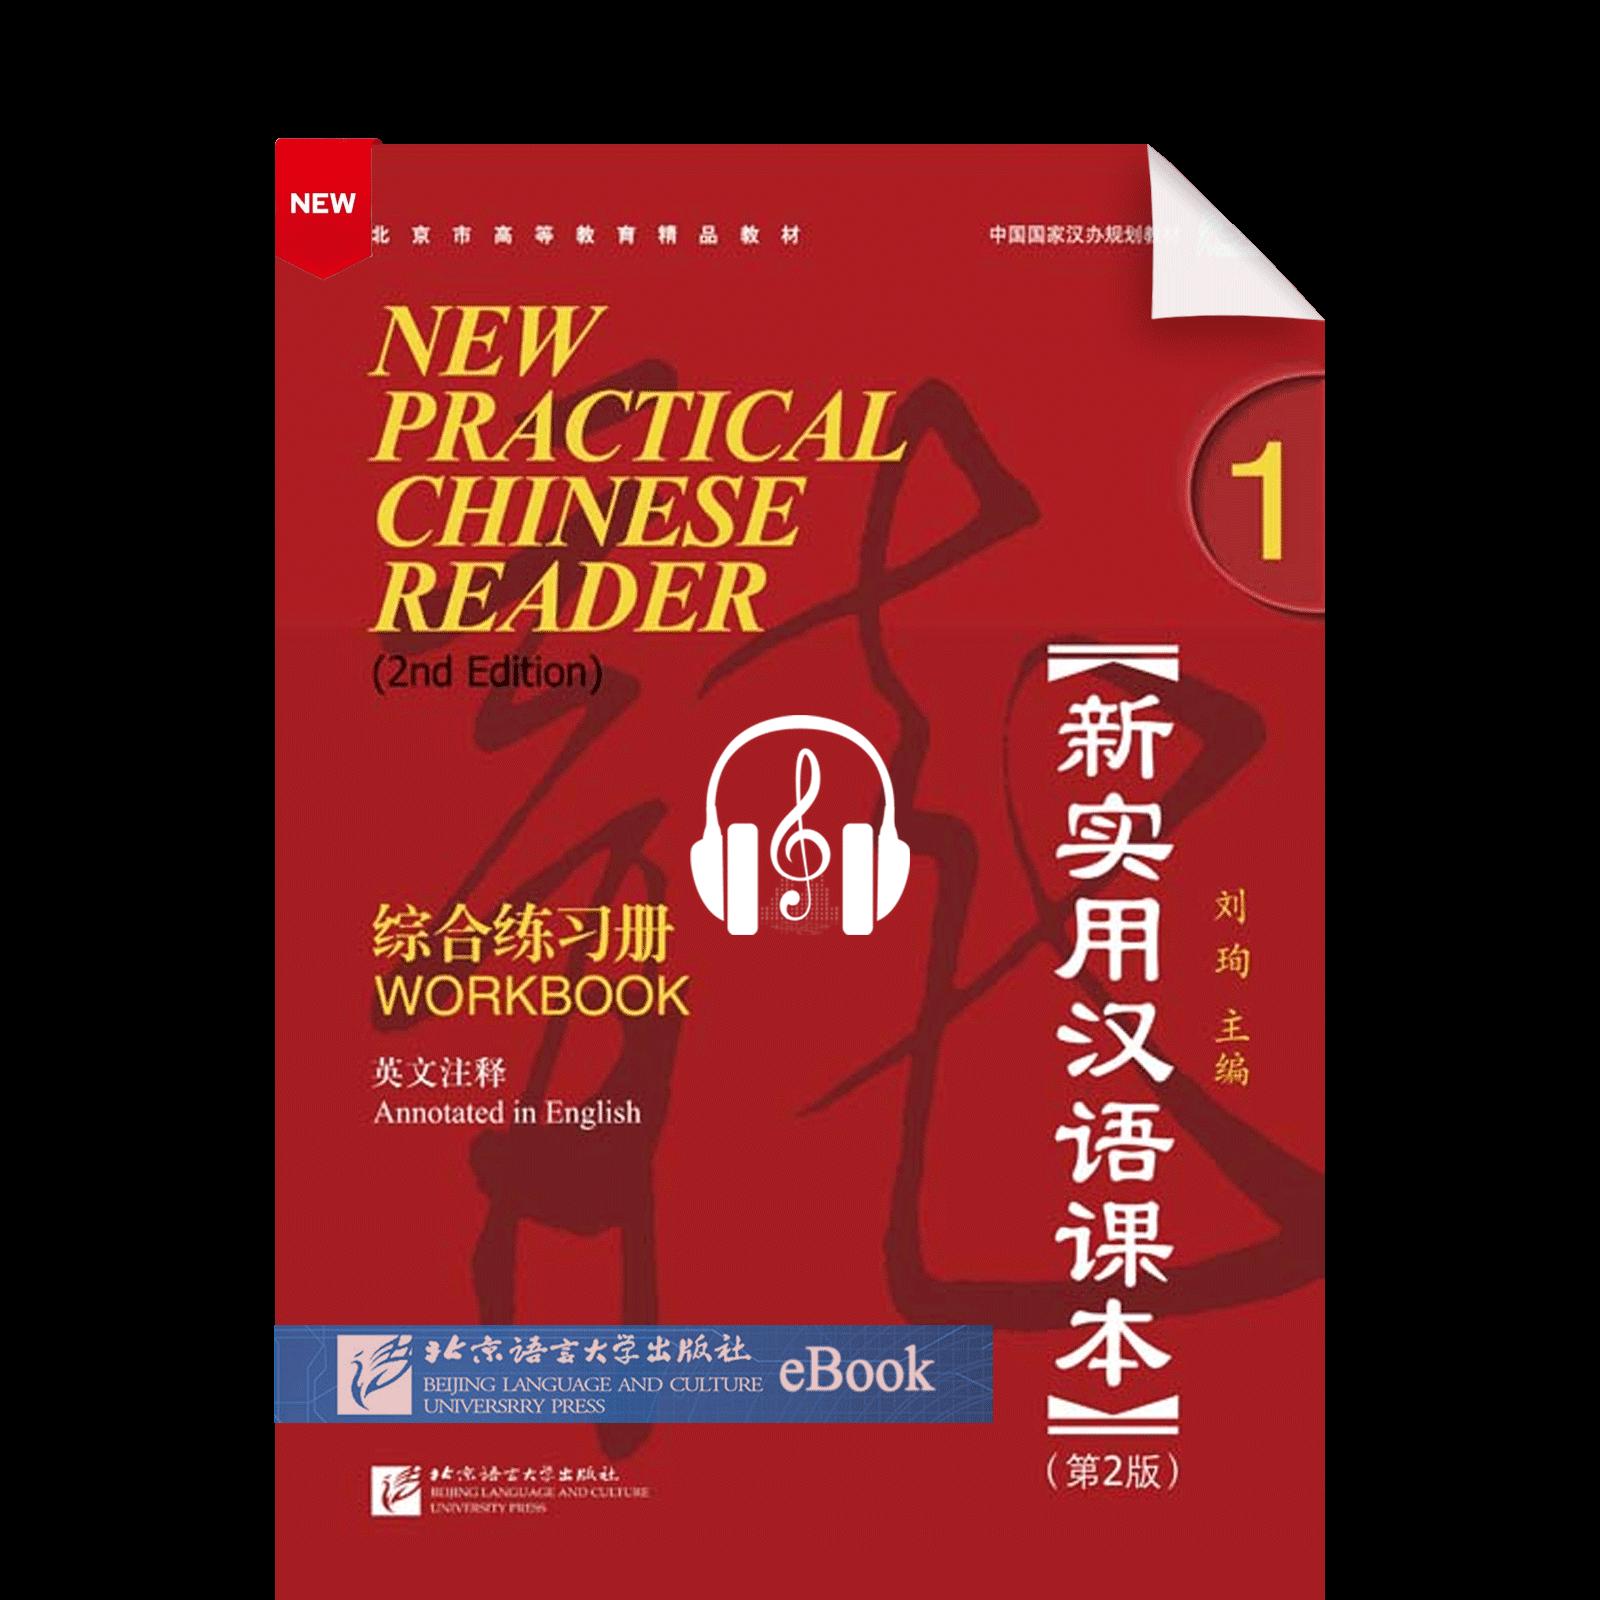 New Practical Chinese Reader Di3Ban Xin Shiyong Hanyu Keben Di1Ce Workbook with Audio